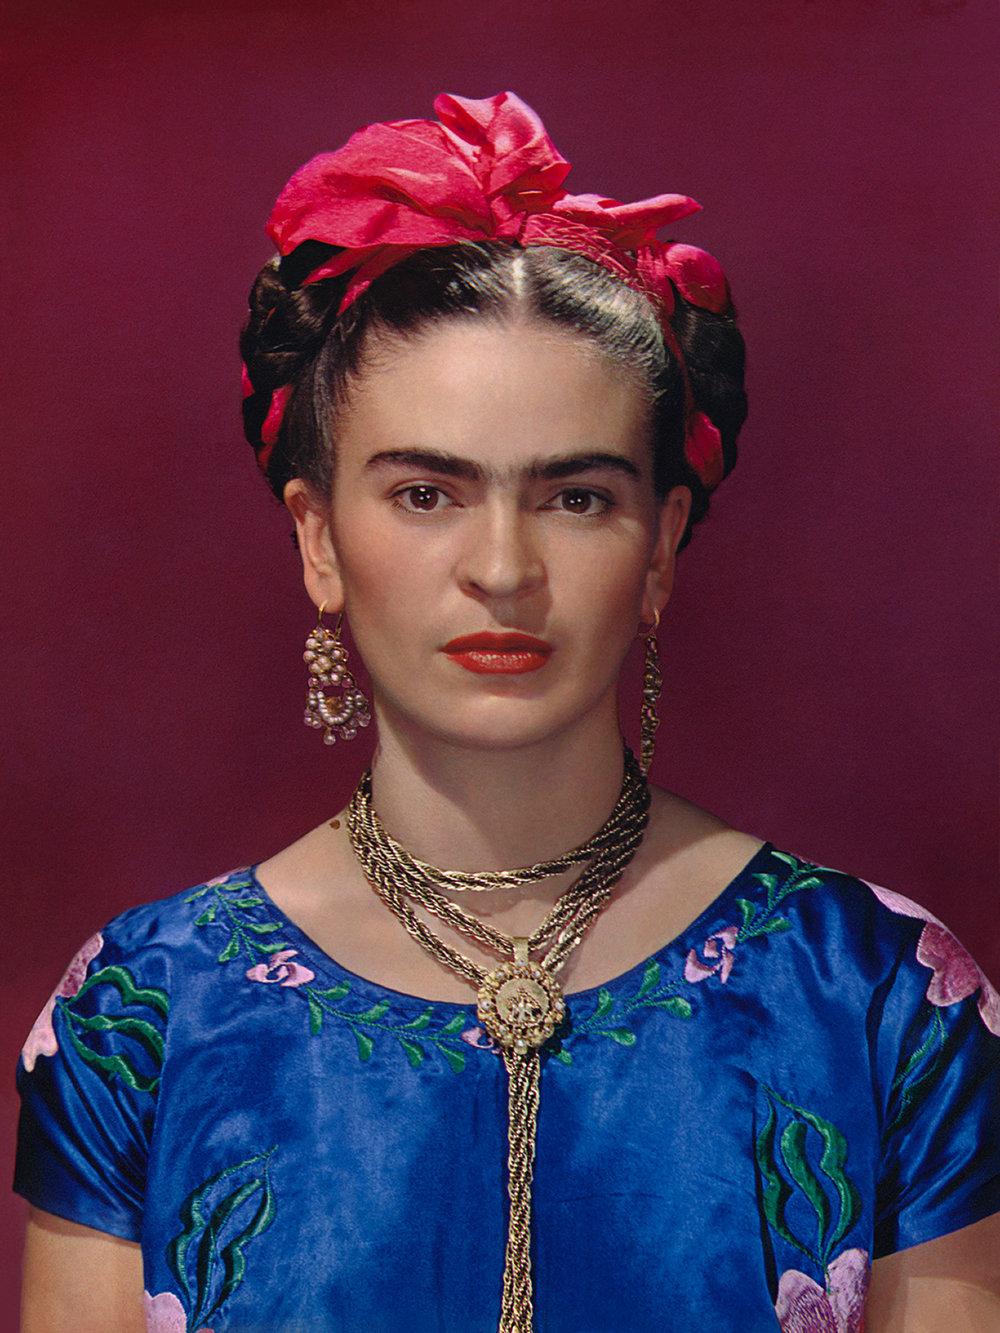 Frida Kahlo in blue satin blouse, 1939. Photograph Nickolas Muray © Nickolas Muray Photo Archives